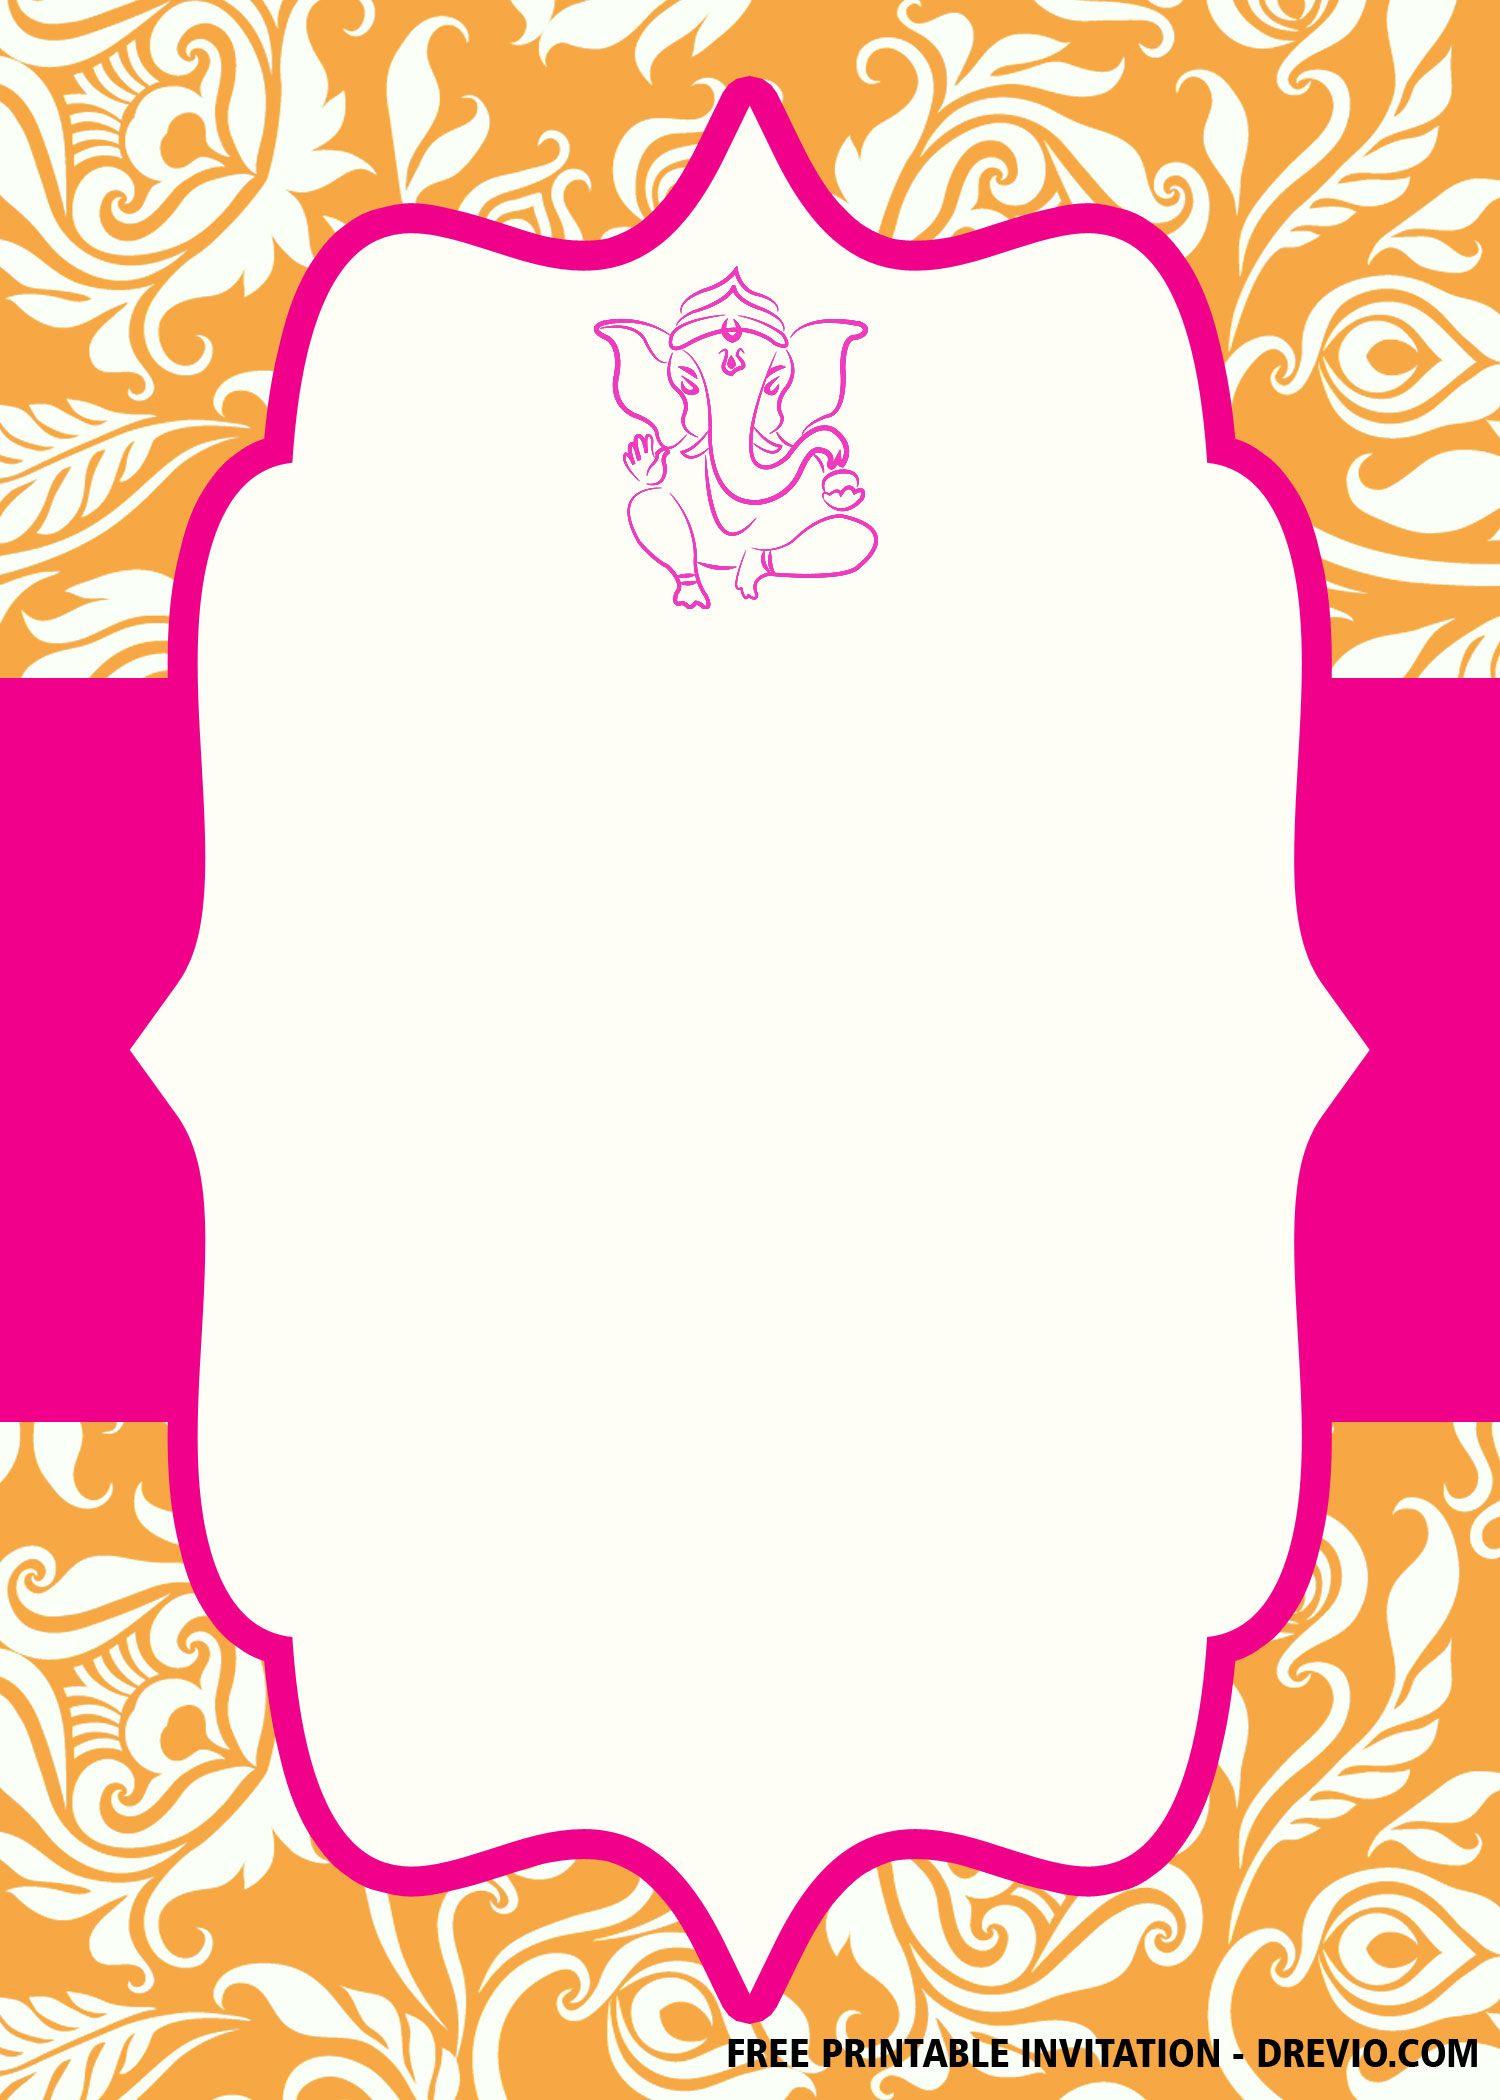 Free Ganesha Wedding Invitation Templates Drevio Ganpati Invitation Card Wedding Invitation Templates Indian Wedding Invitation Cards